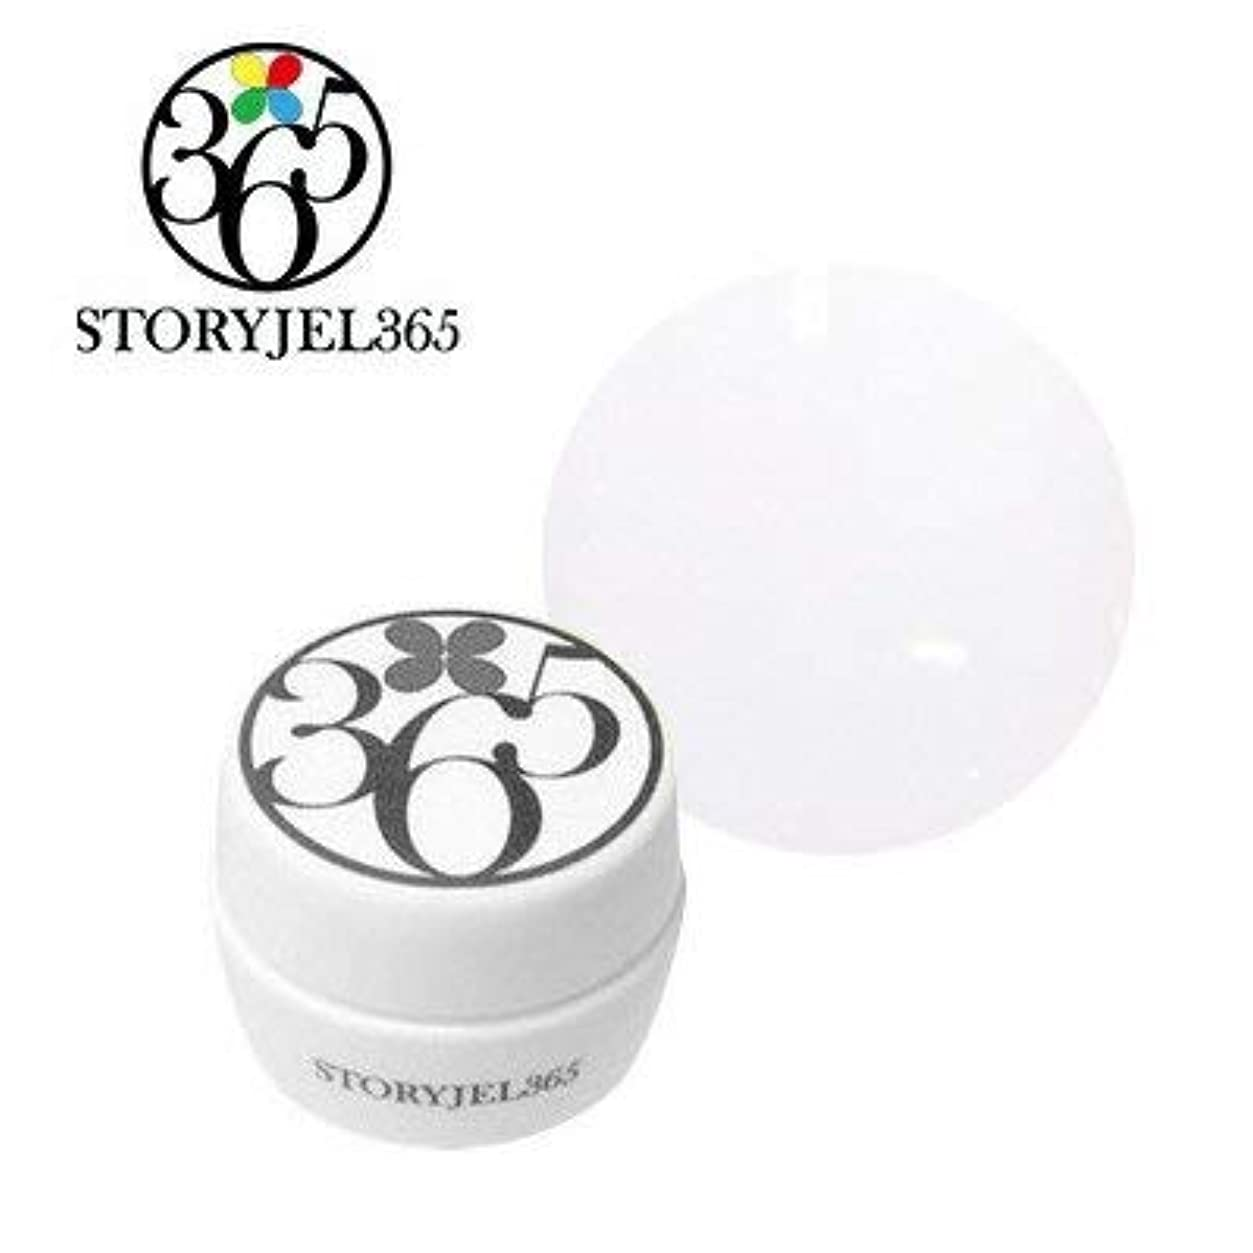 STORYJEL365 カラージェル クラムチャウダー 5g SJS-086